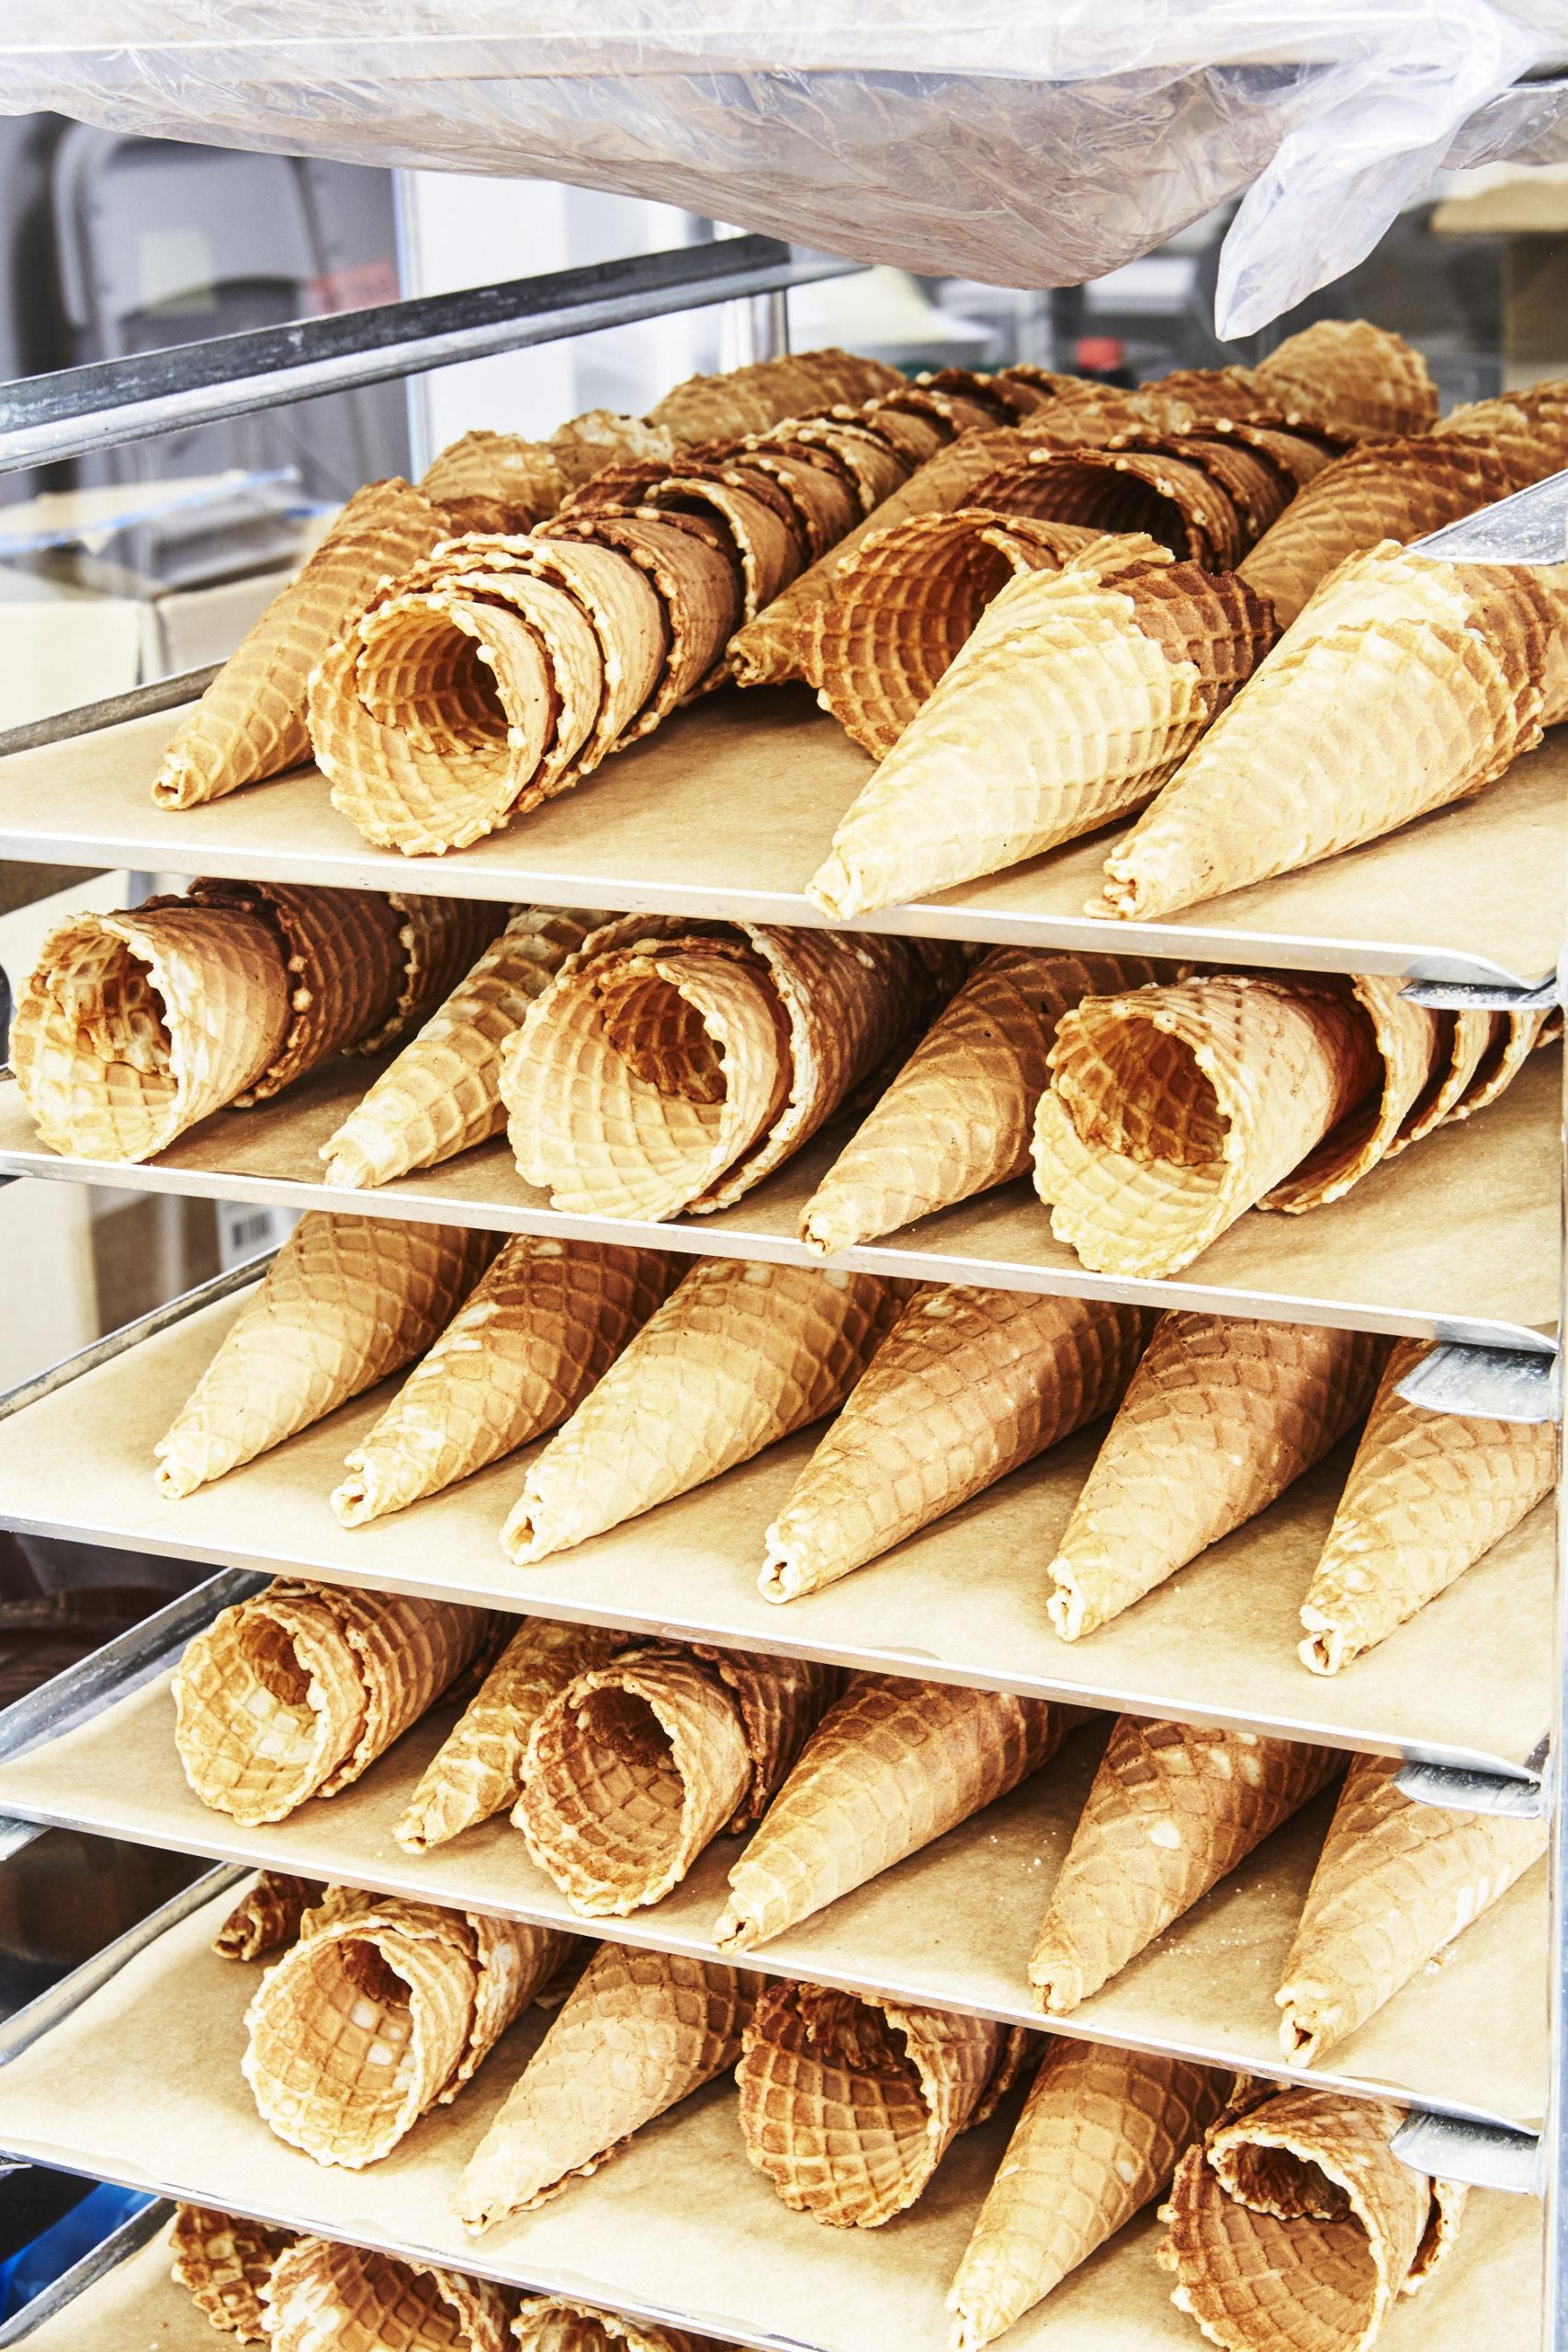 Handmade ice cream wafers